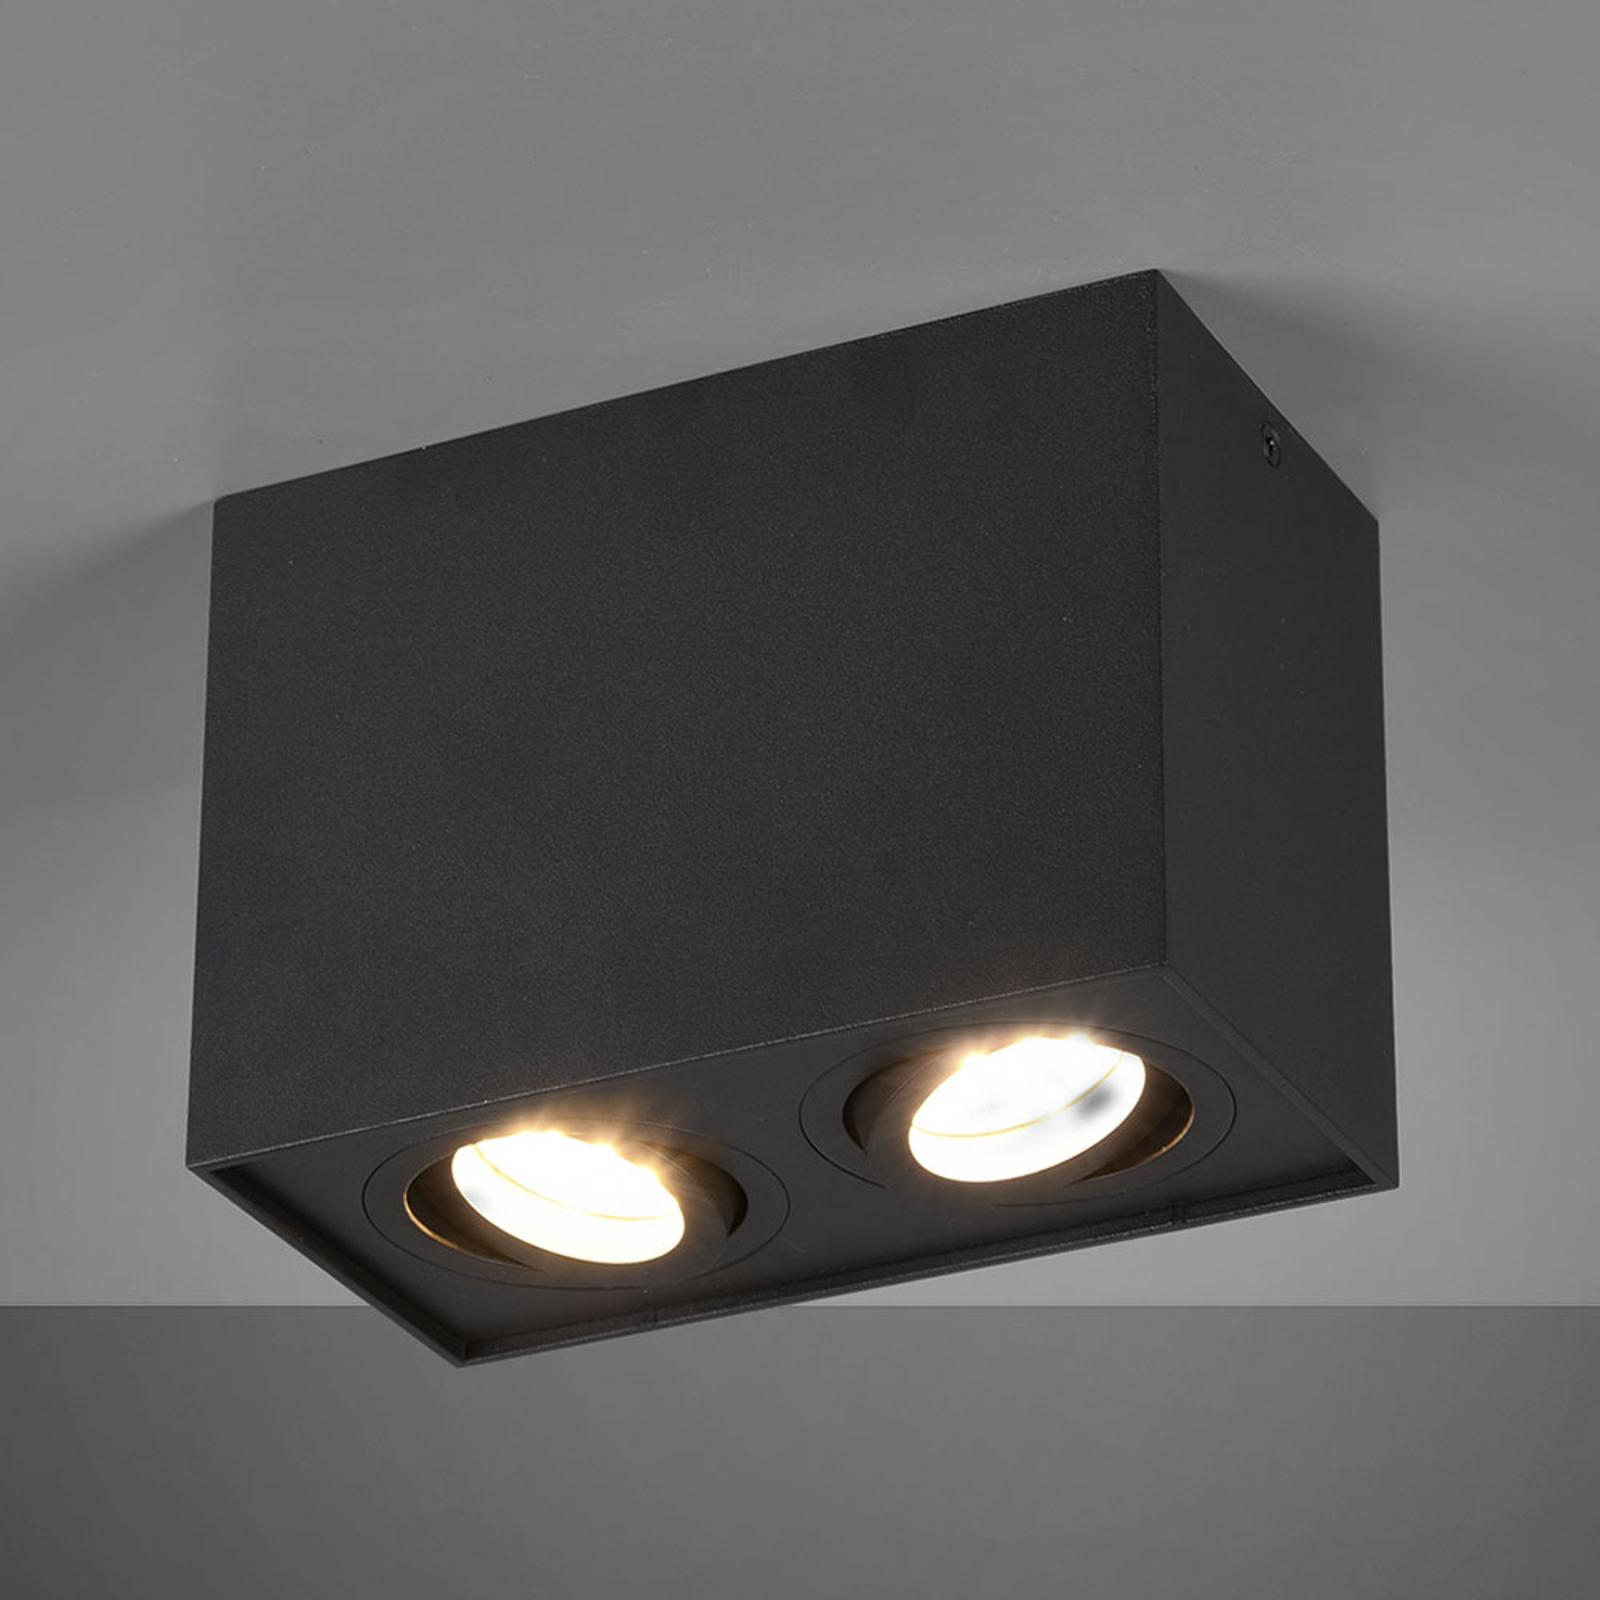 Plafondlamp Biscuit, 2-lamps, zwart